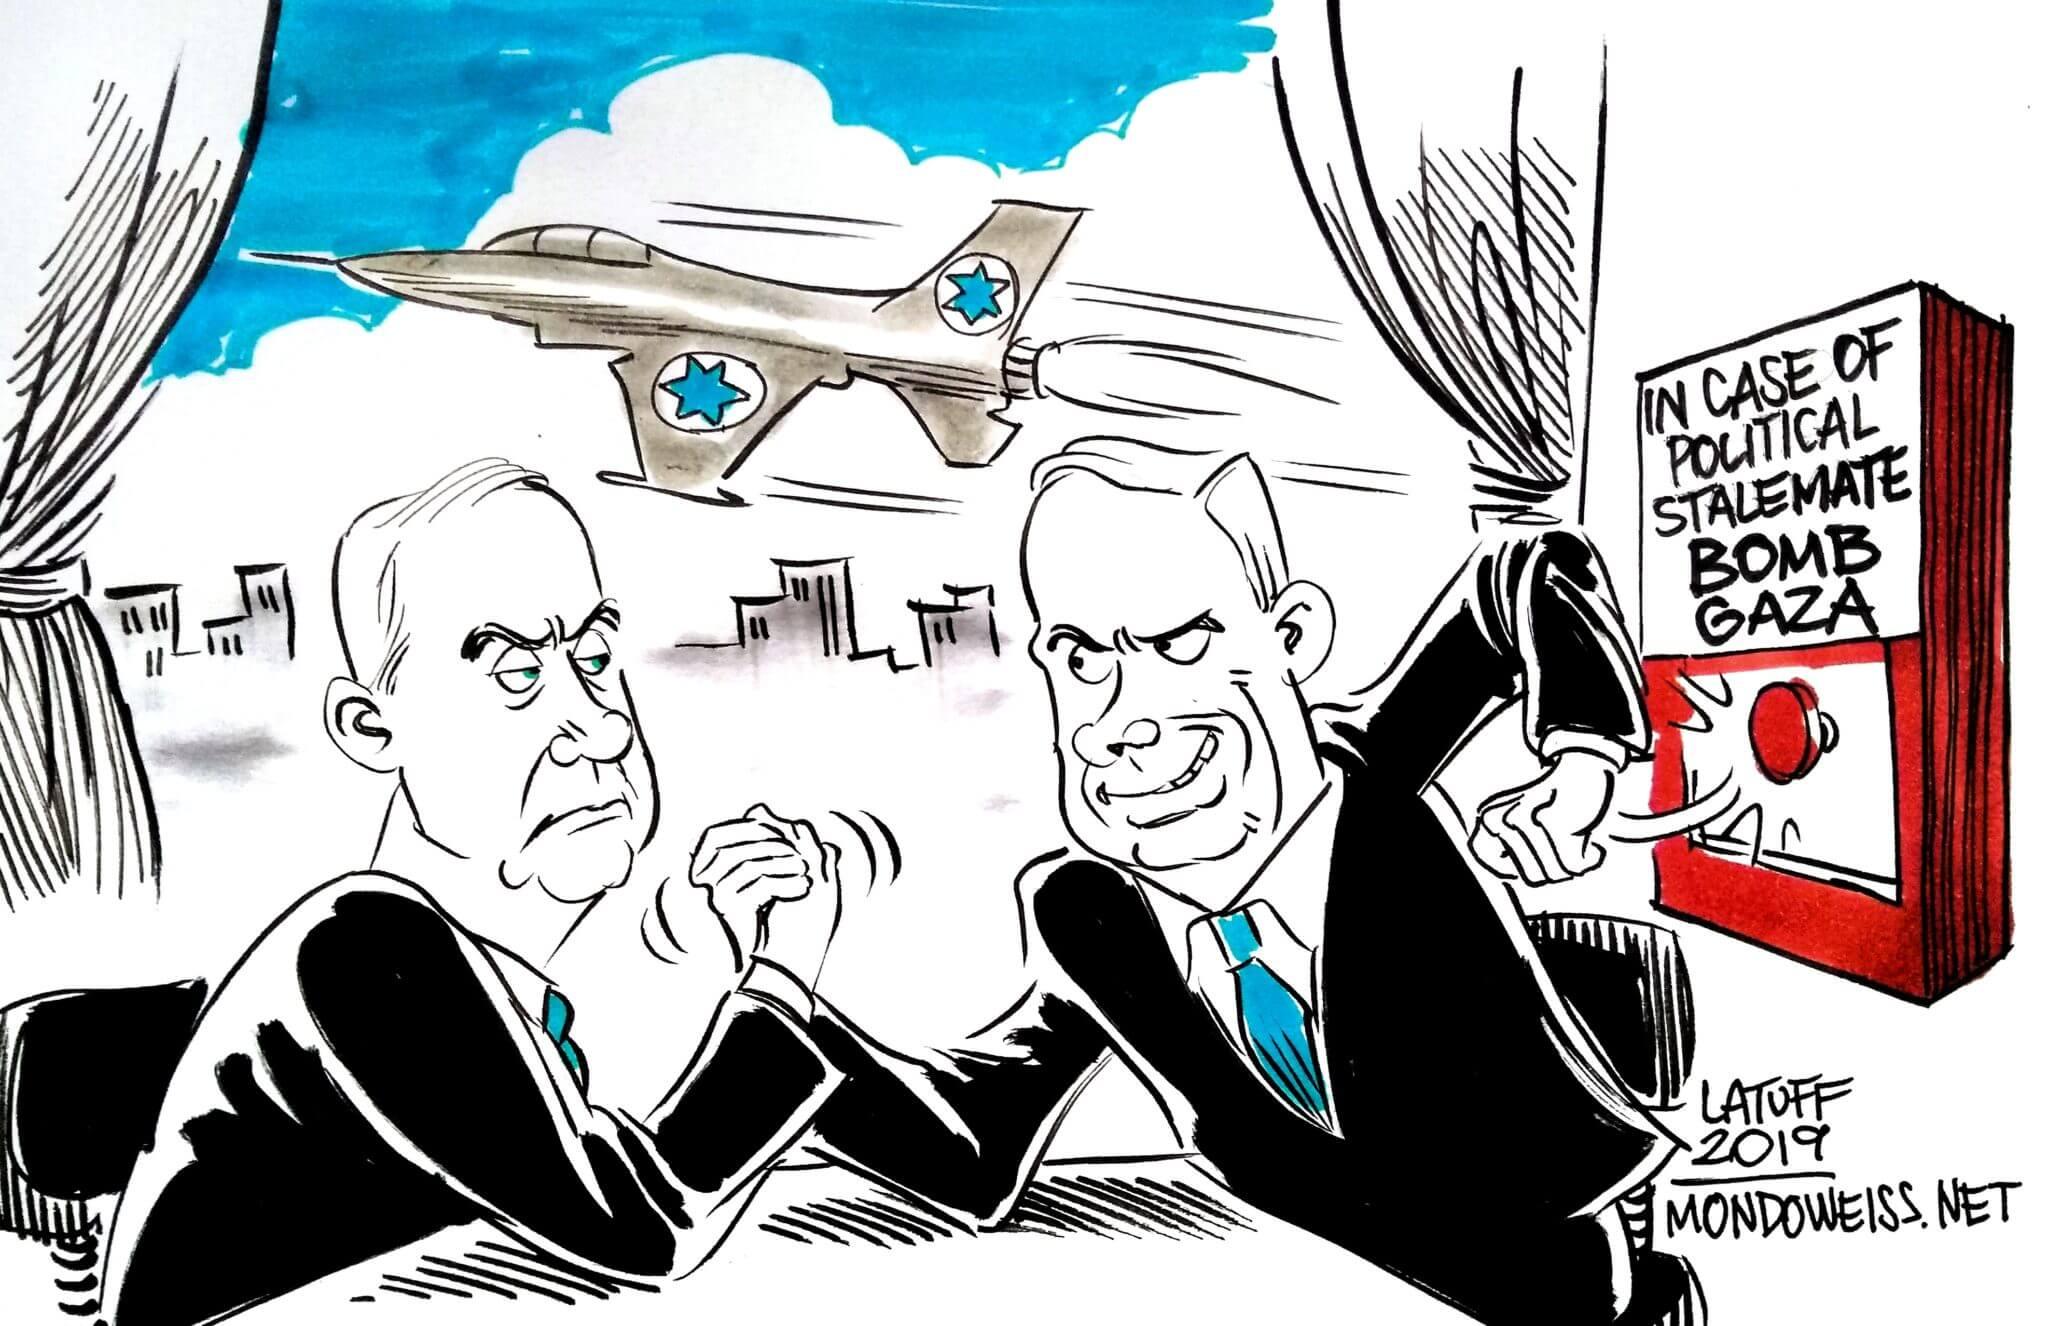 In the battle between Netanyahu and Gantz, Gaza pays the price. (Cartoon: Carlos Latuff)